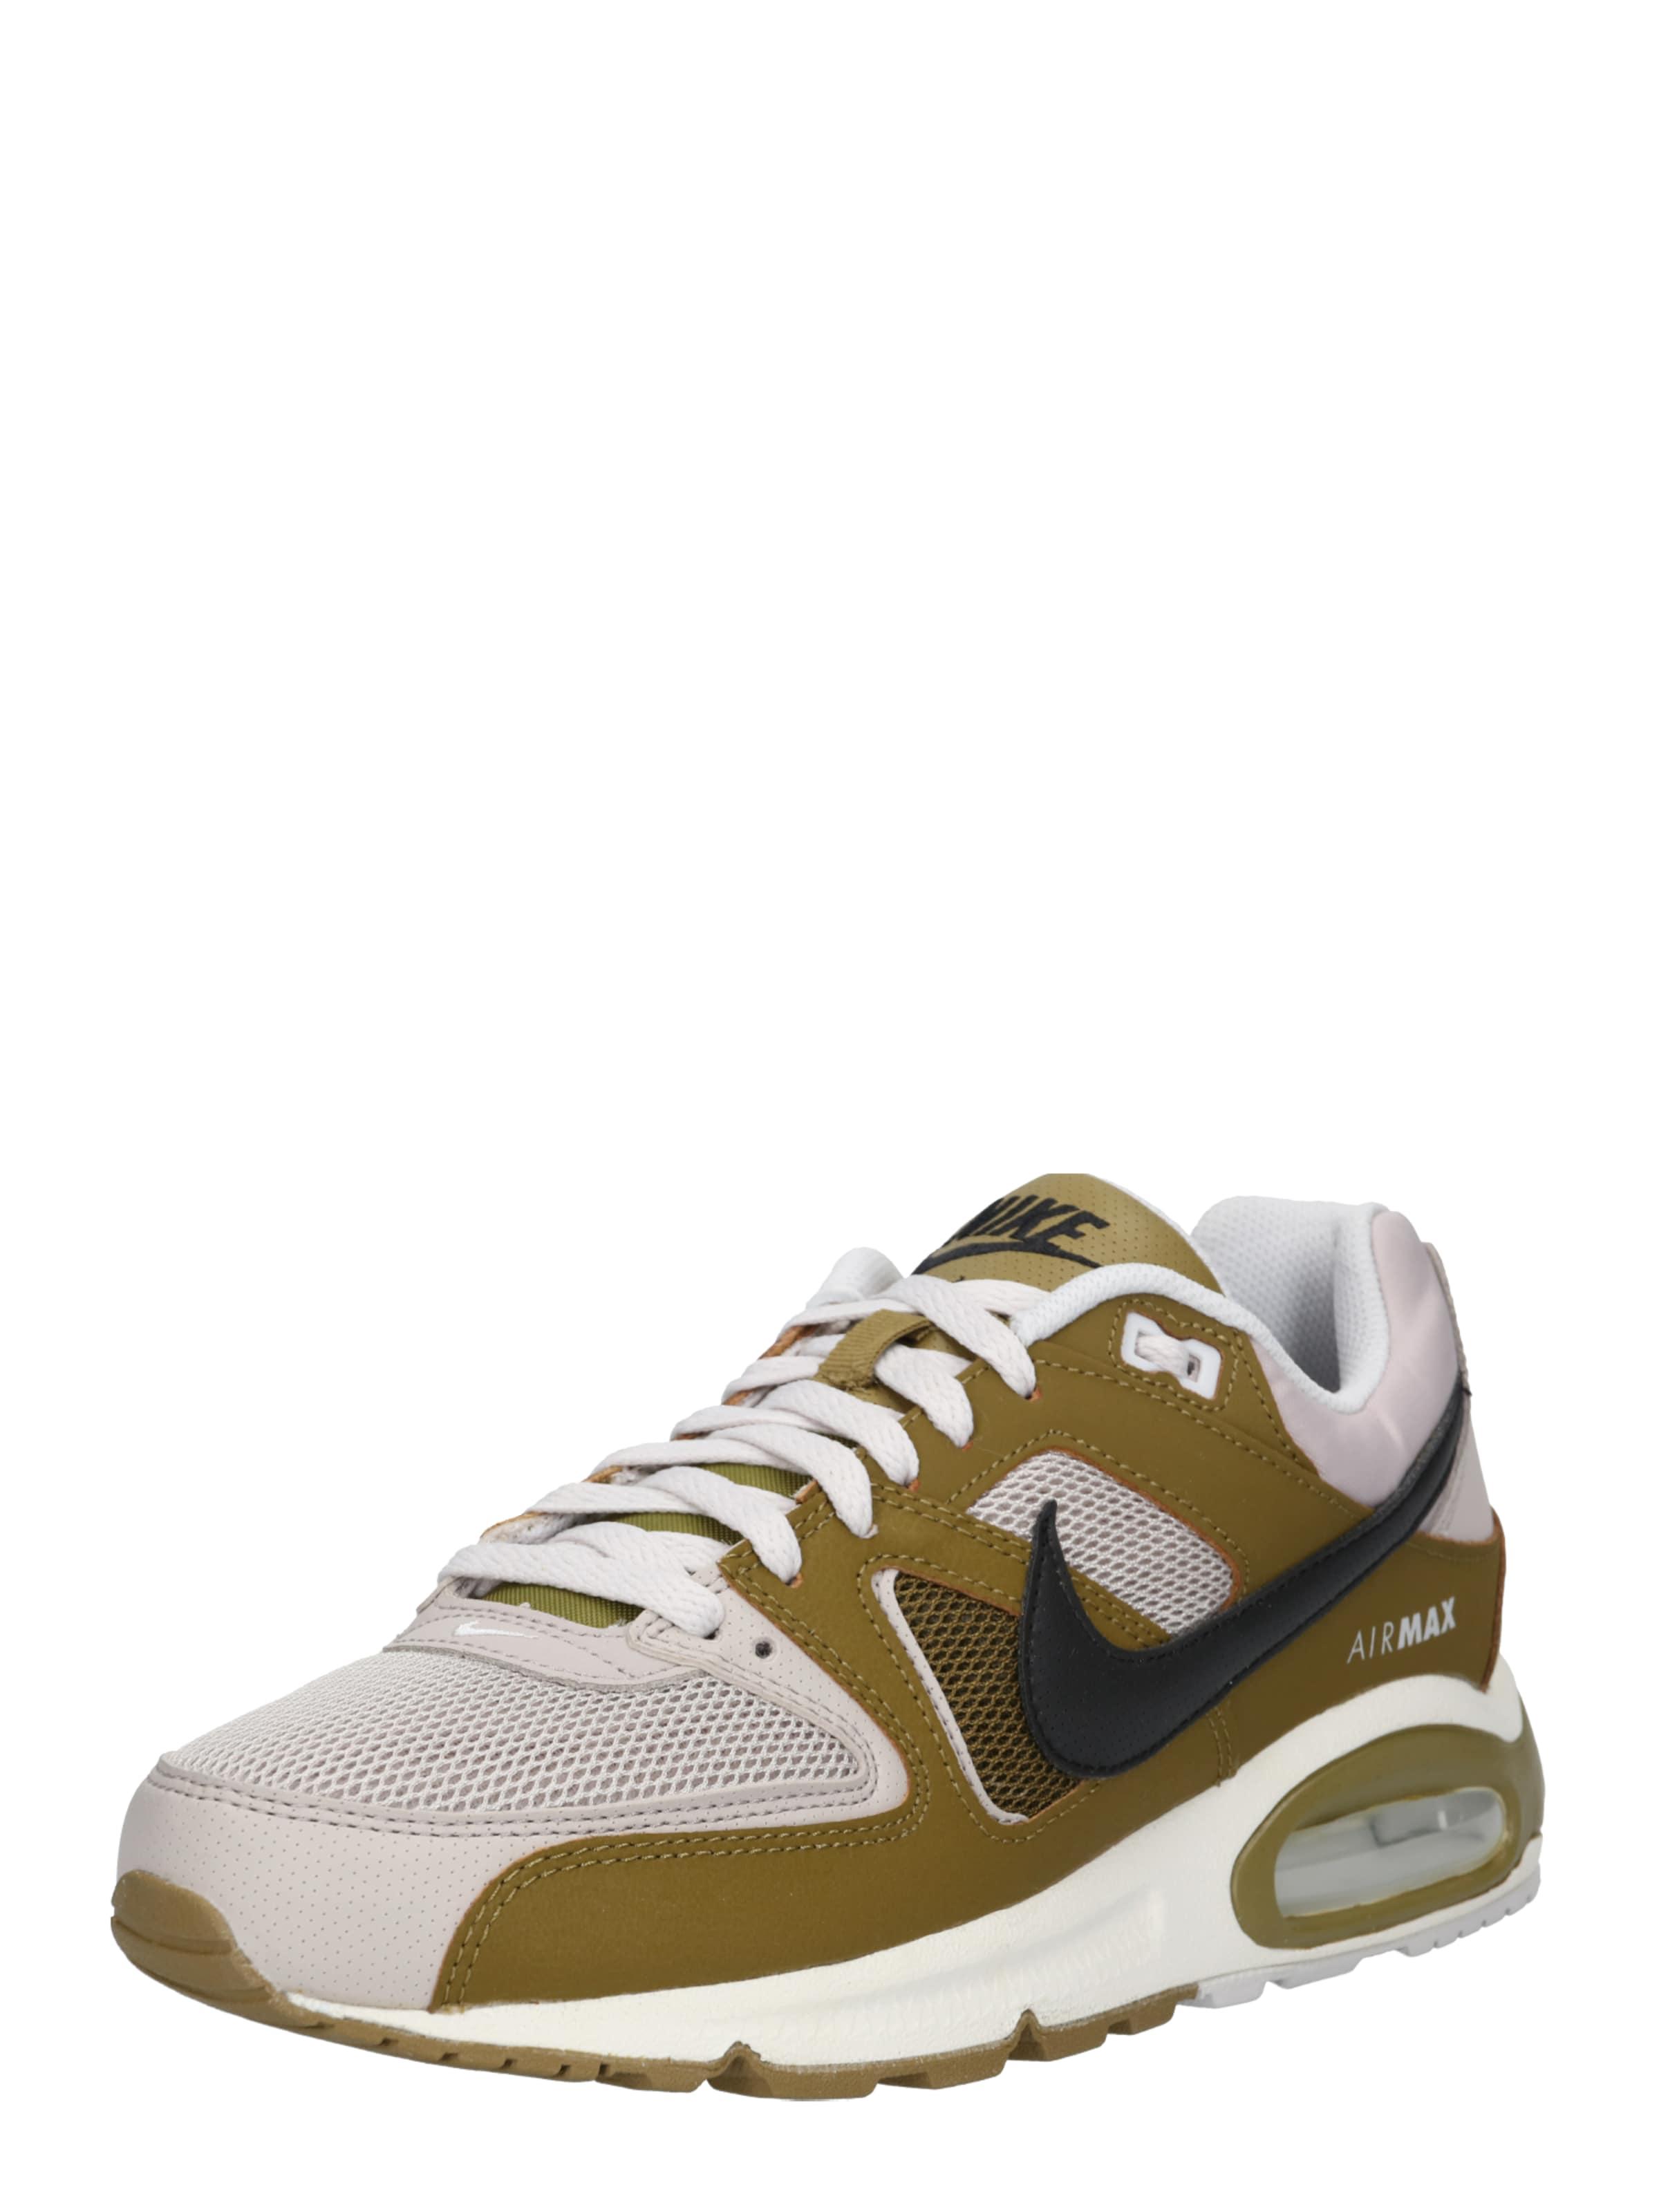 HellgrauOliv Sneaker 'air Command' Max Nike Sportswear In nkP0wO